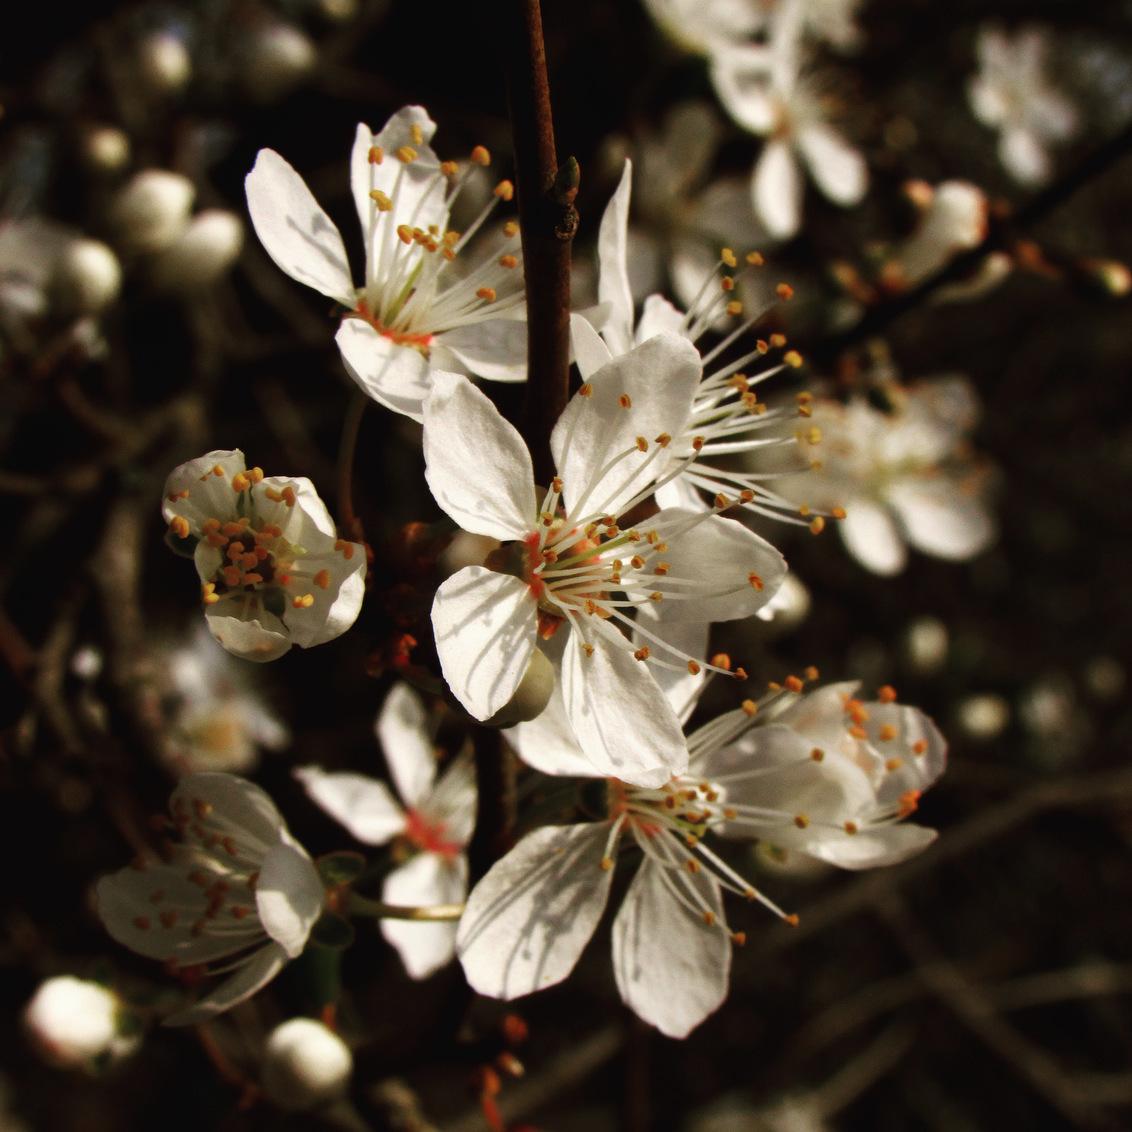 1D8D091A-F426-4BE8-920F-73EC2B94DBEC - Prunus cerasifera - foto door AnnaMasur op 09-03-2021 - deze foto bevat: macro, boom, bloem, lente, natuur, licht, prunus